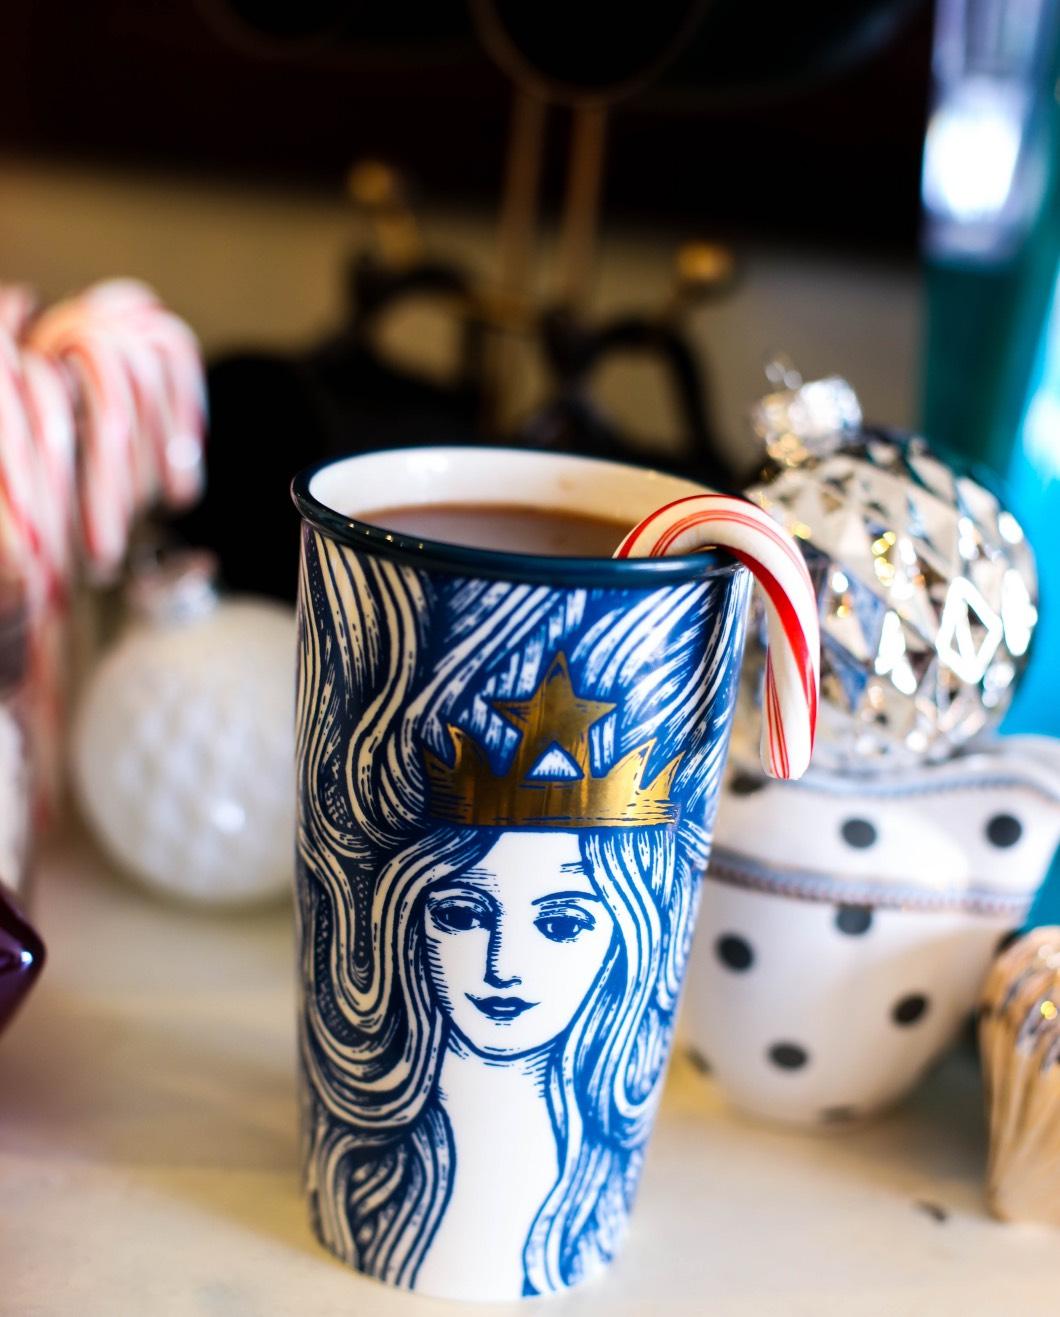 starbucks peppermint mocha latter yummy - Starbucks Christmas Coffee Bar by Atlanta style blogger Happily Hughes